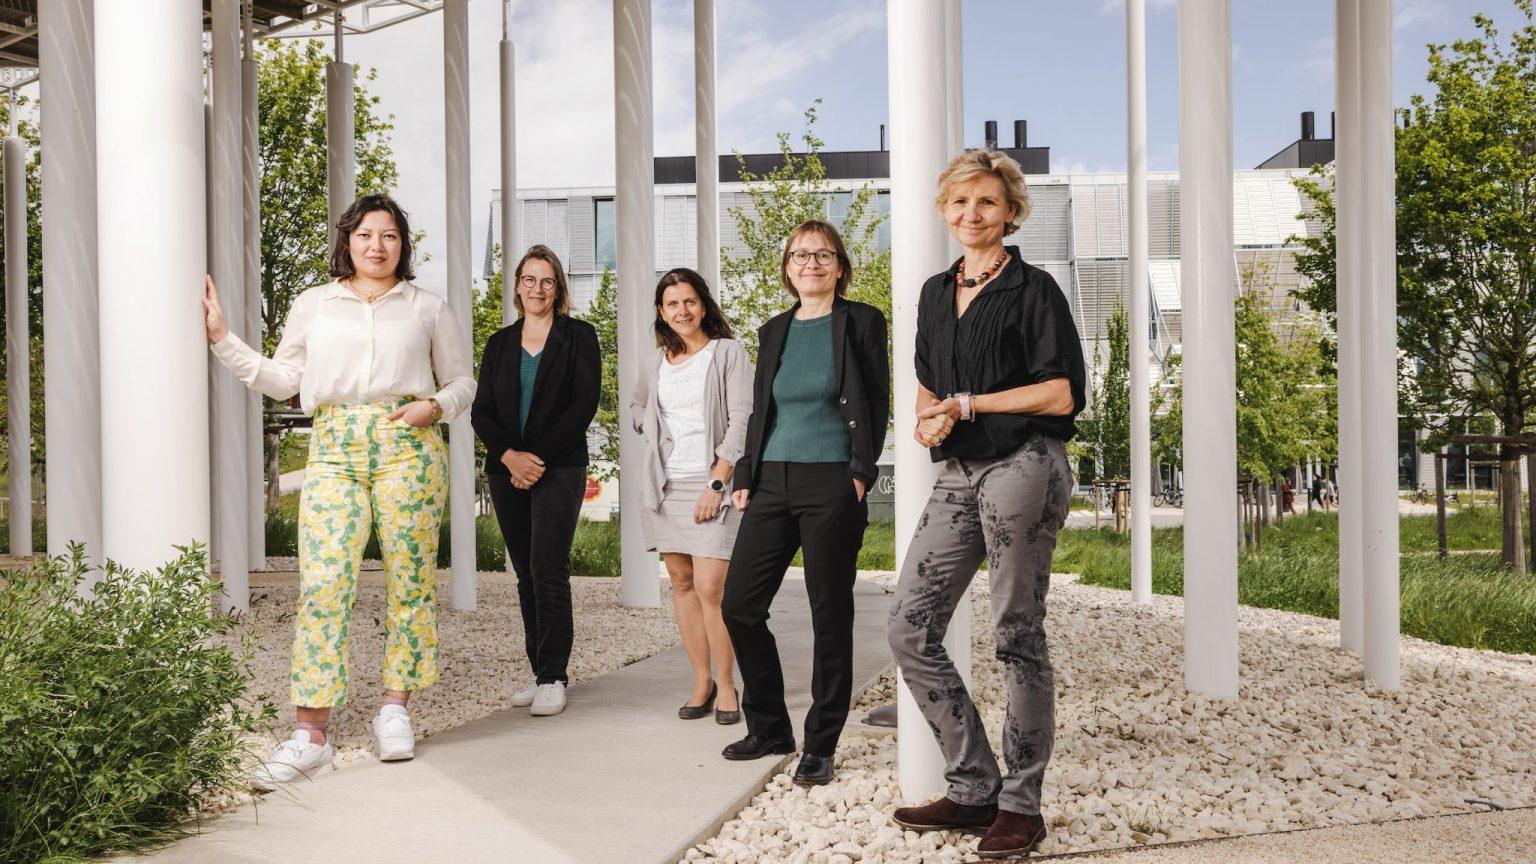 De gauche à droite: Natasha Stegmann, Kristin Becker von Slooten, Chantal Mellier, Helene Füger, Gisou van der Goot © Niels Ackermann / Lundi13 (2021)